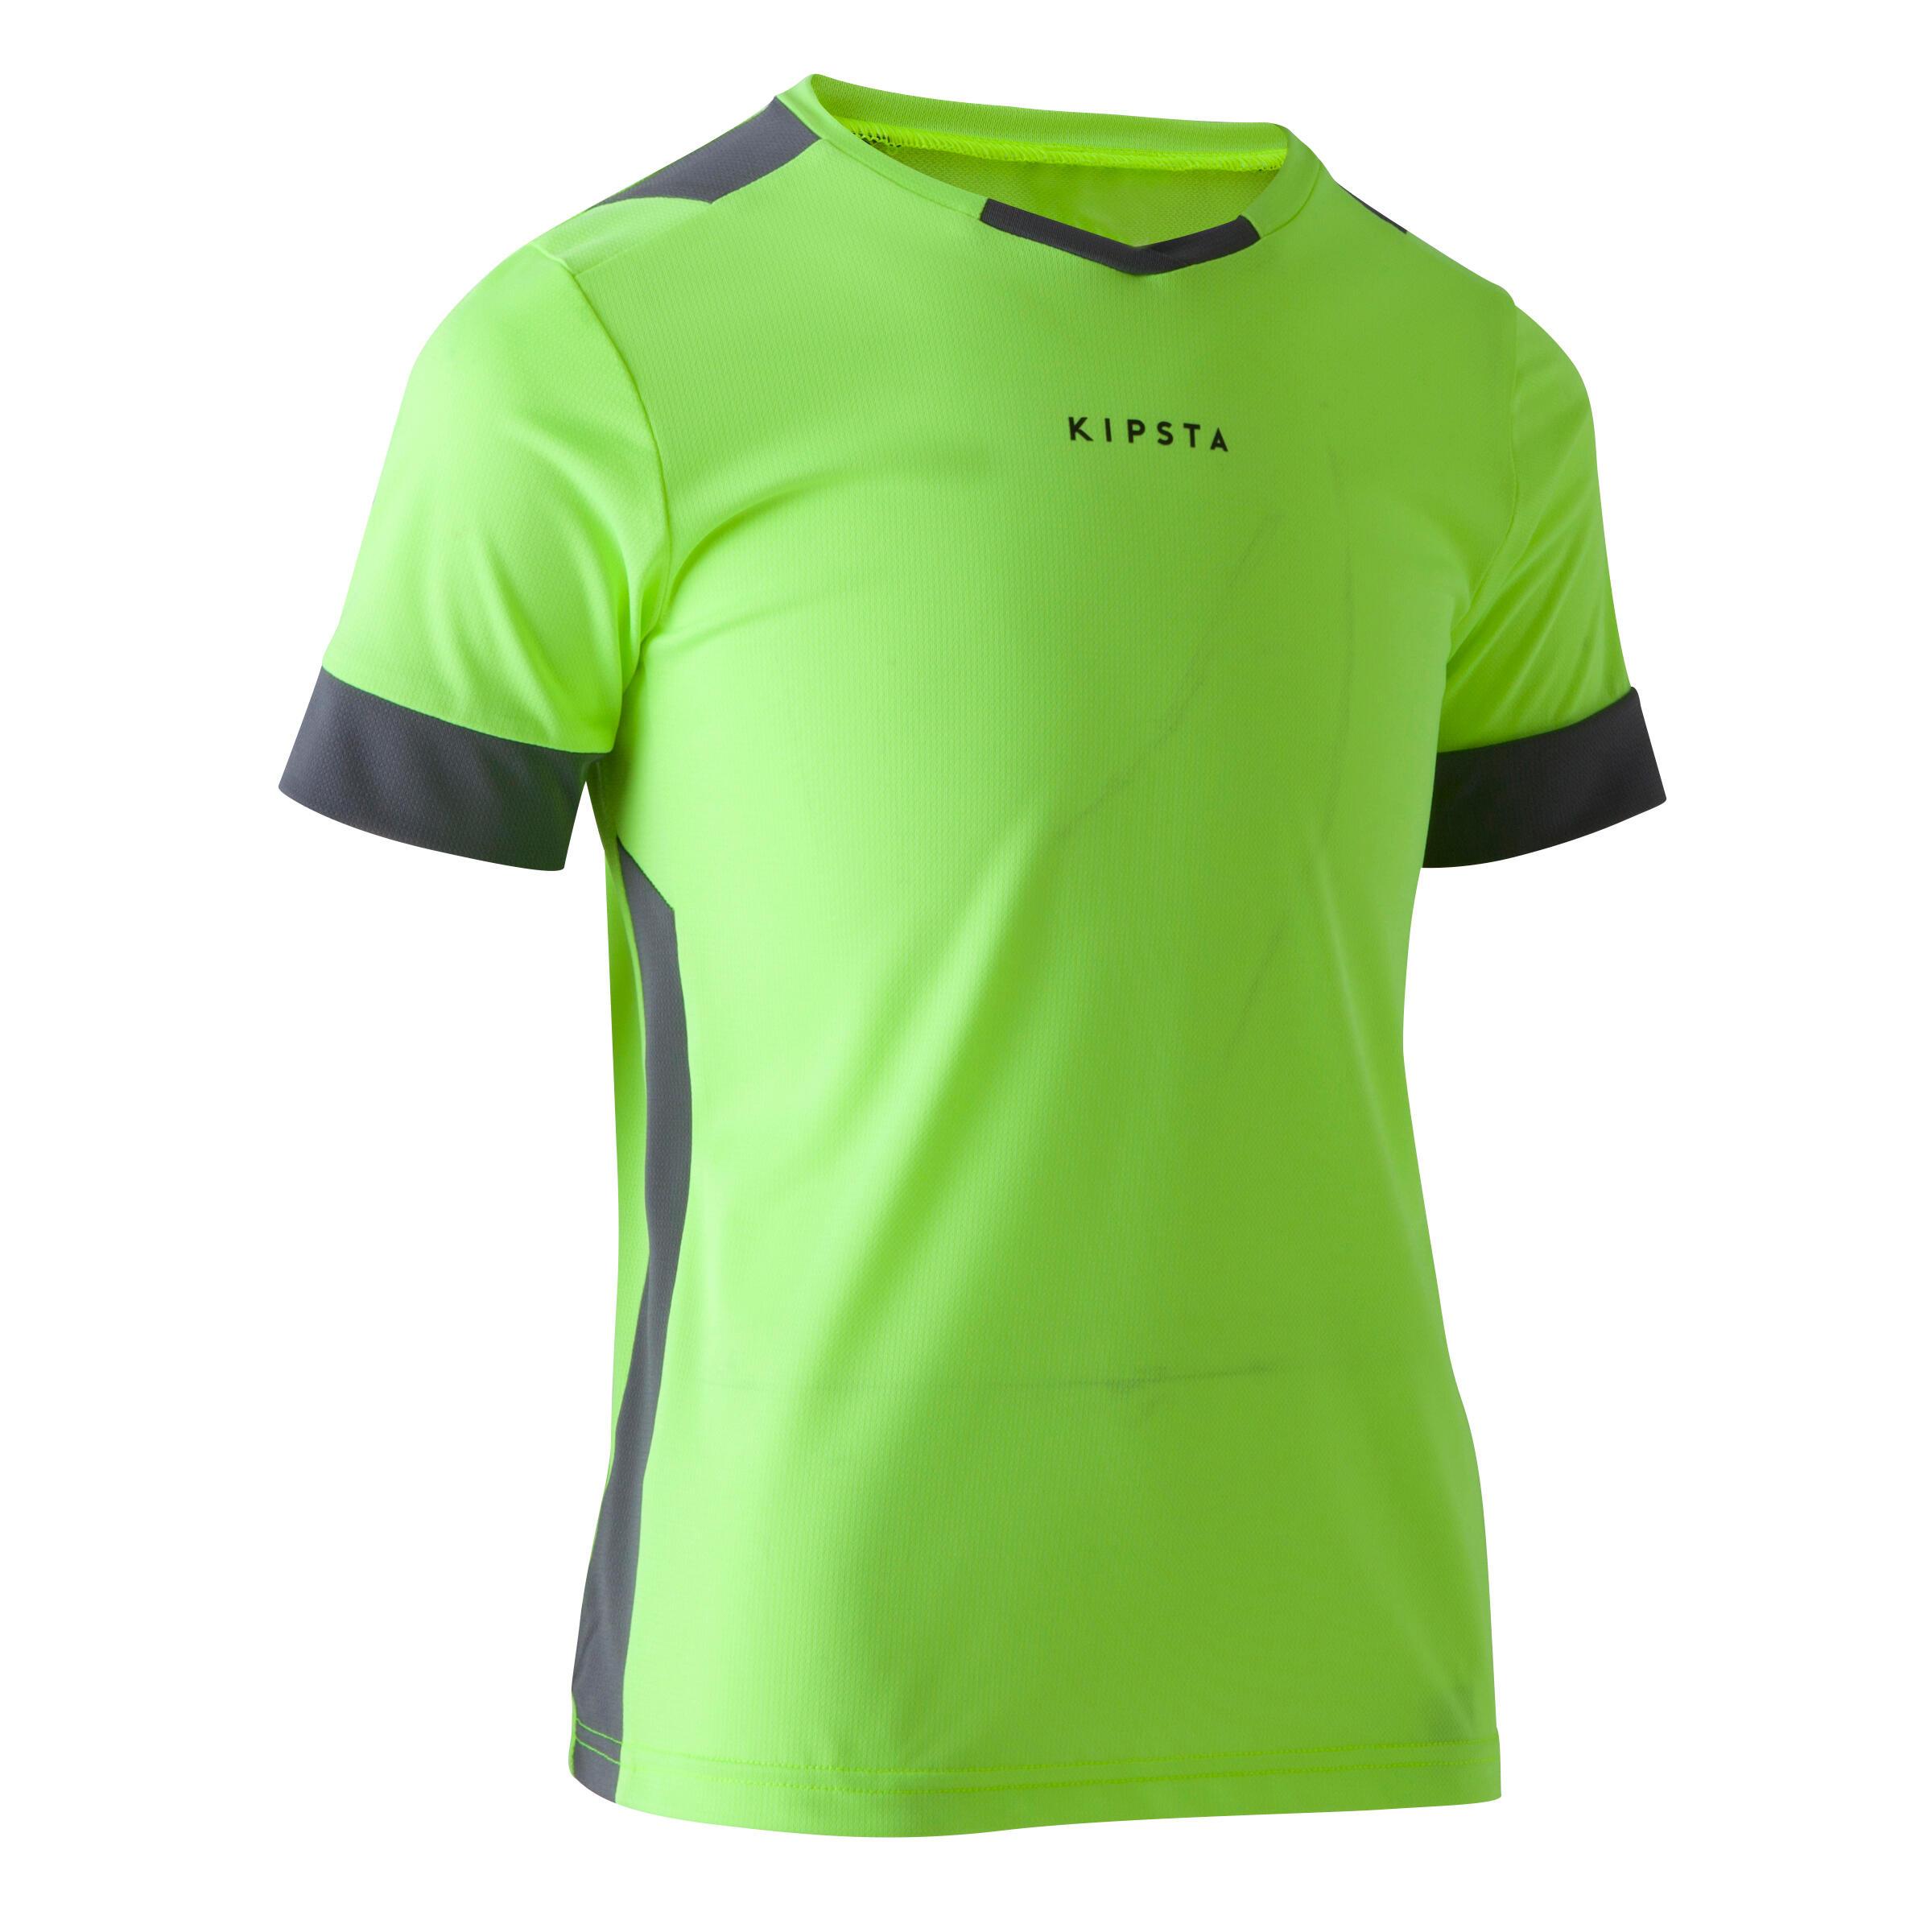 Kipsta Voetbalshirt kind F500 geel